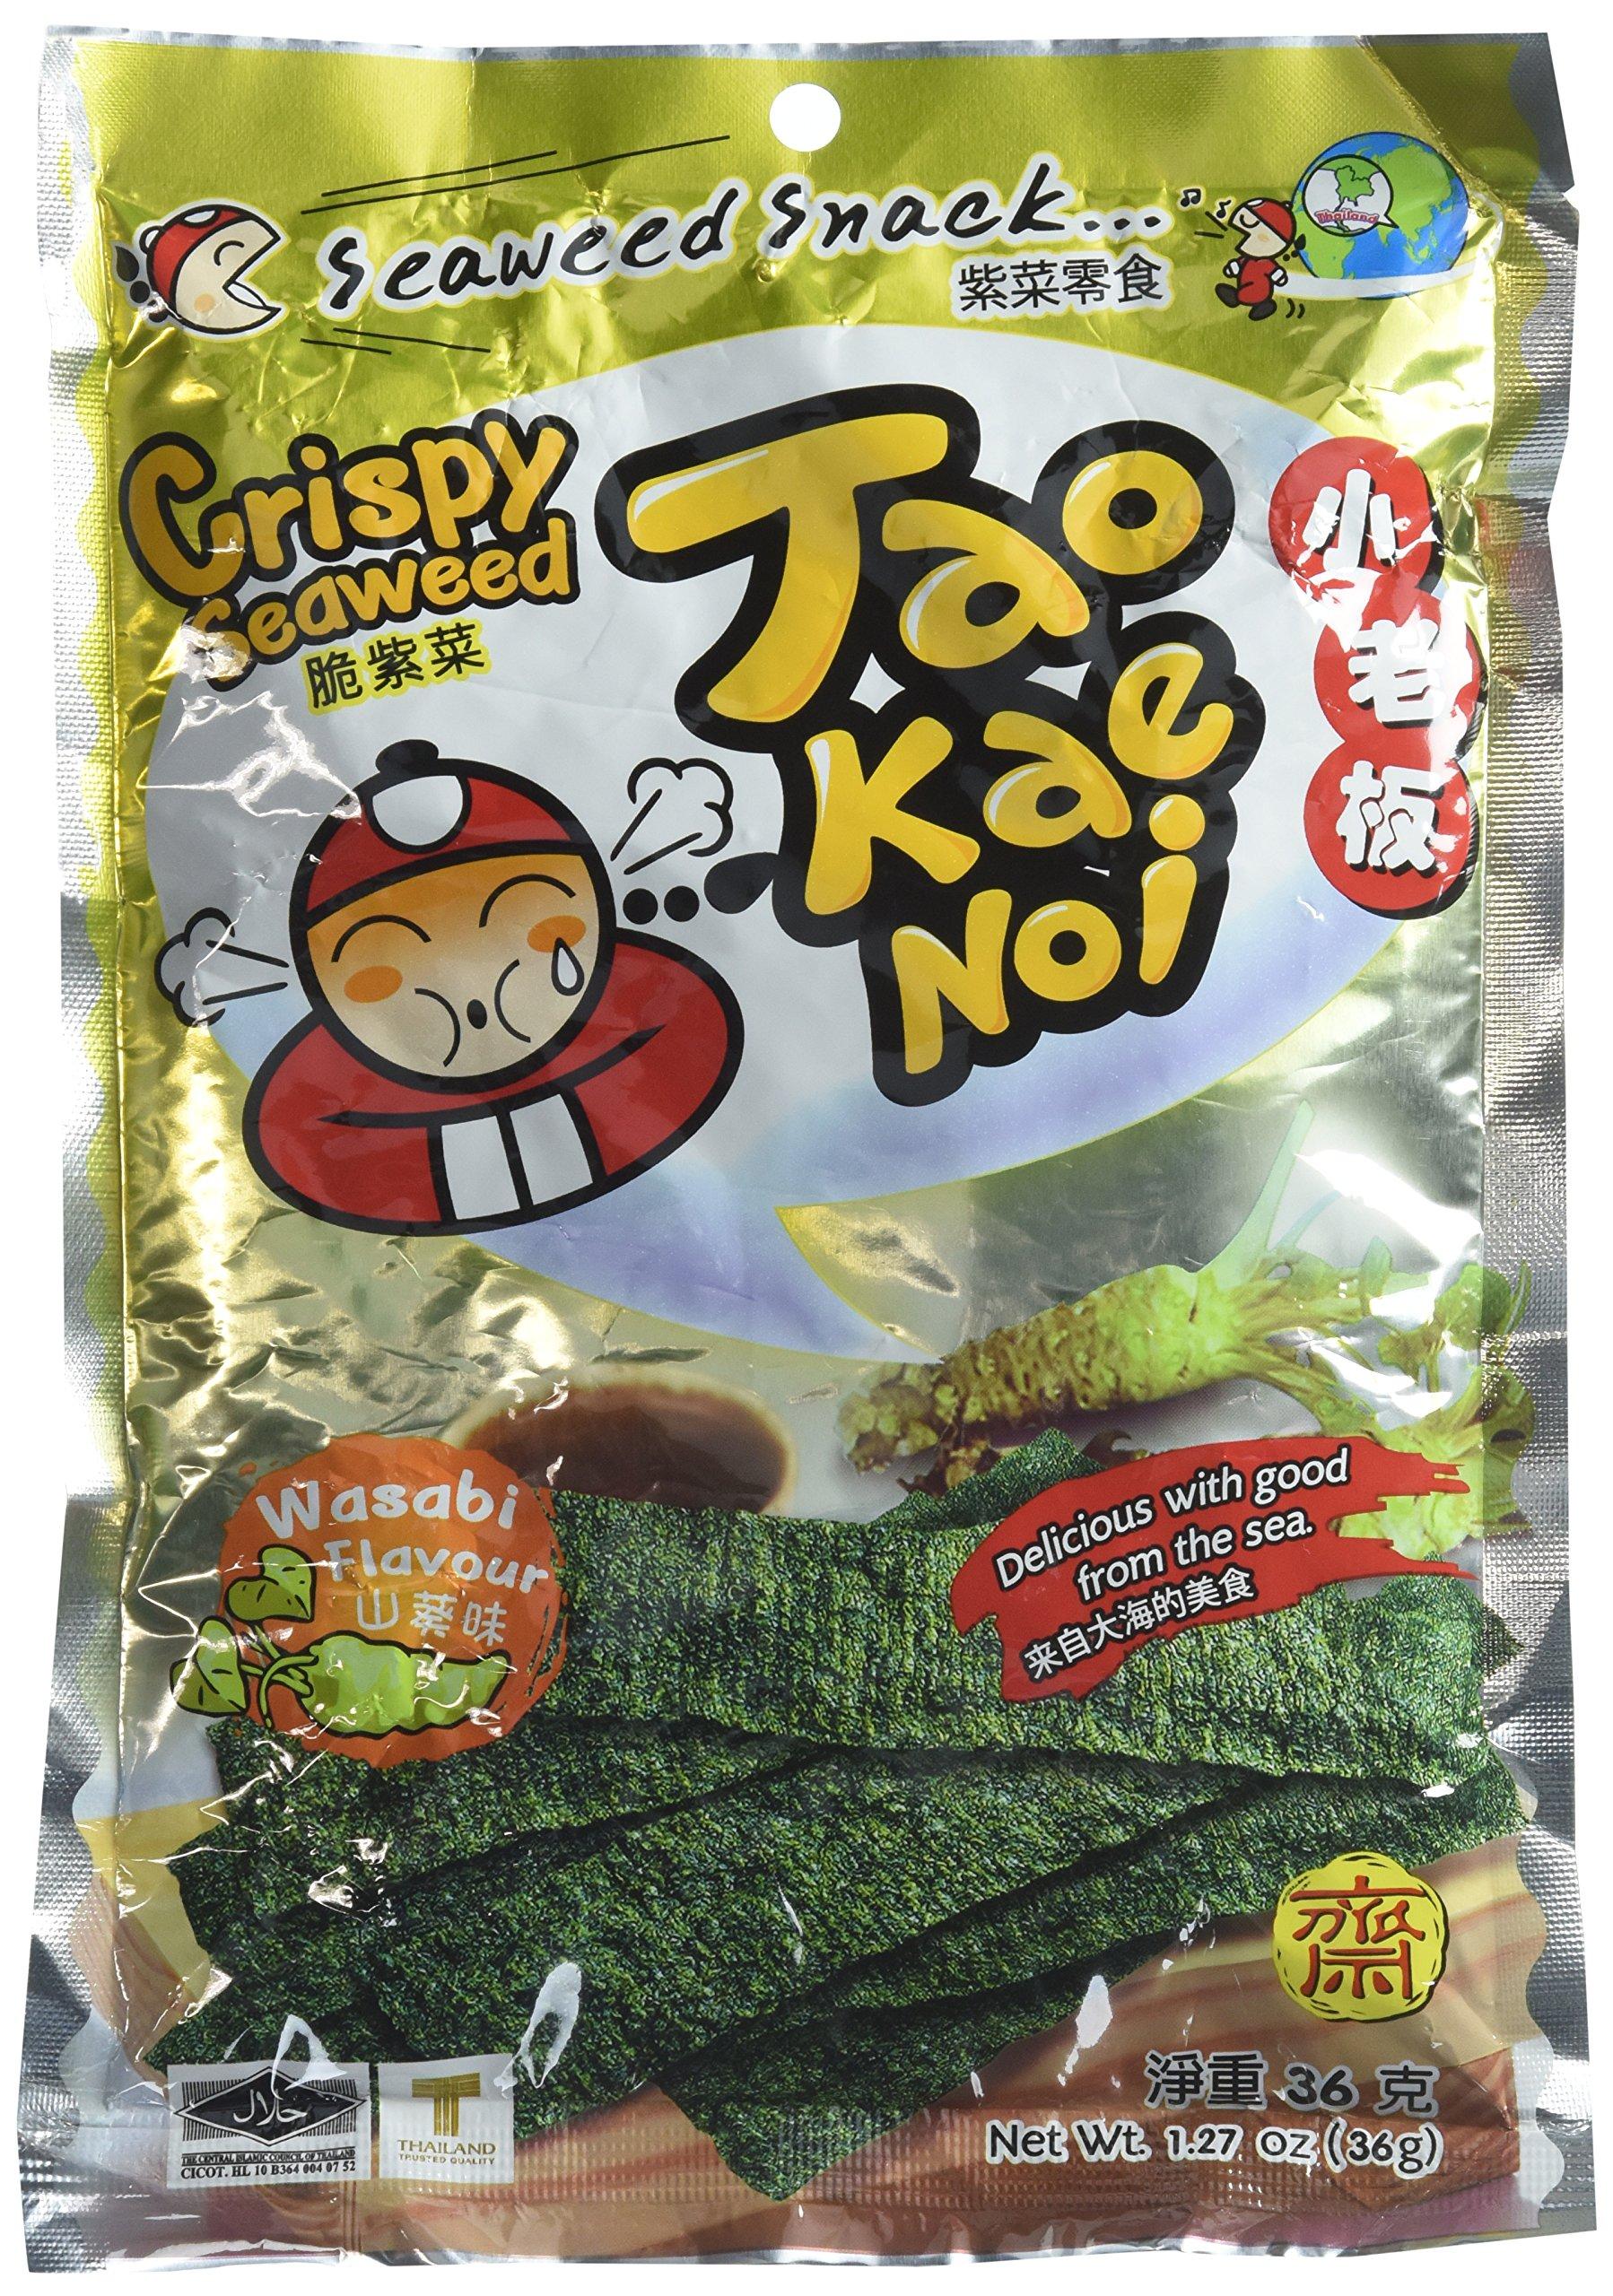 Tao Kae Noi Seaweed Wasabi Flavor (2 Packs)